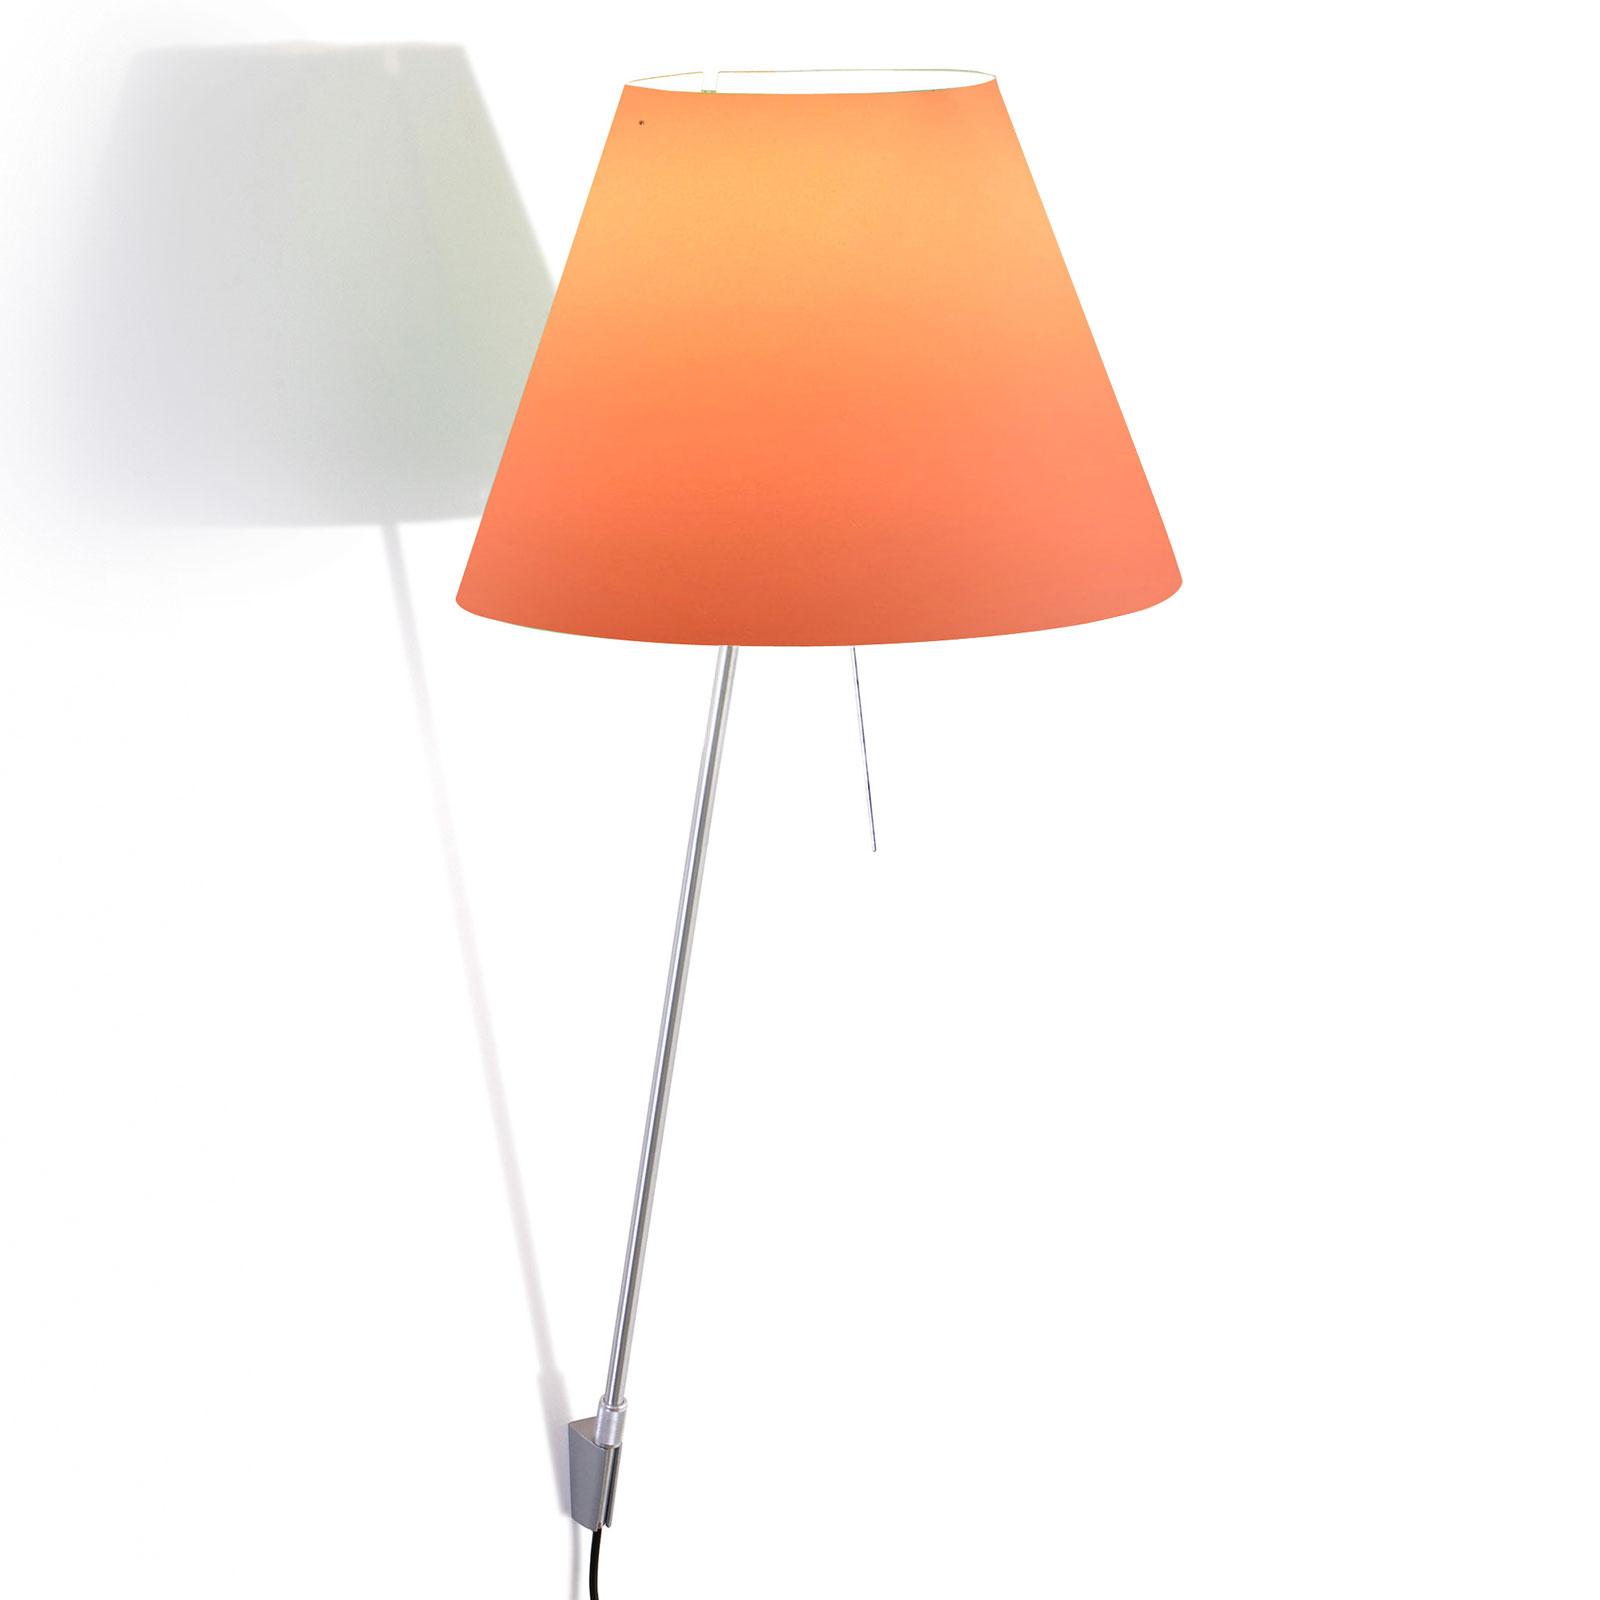 Luceplan Costanza wandlamp D13aif alu/poeder